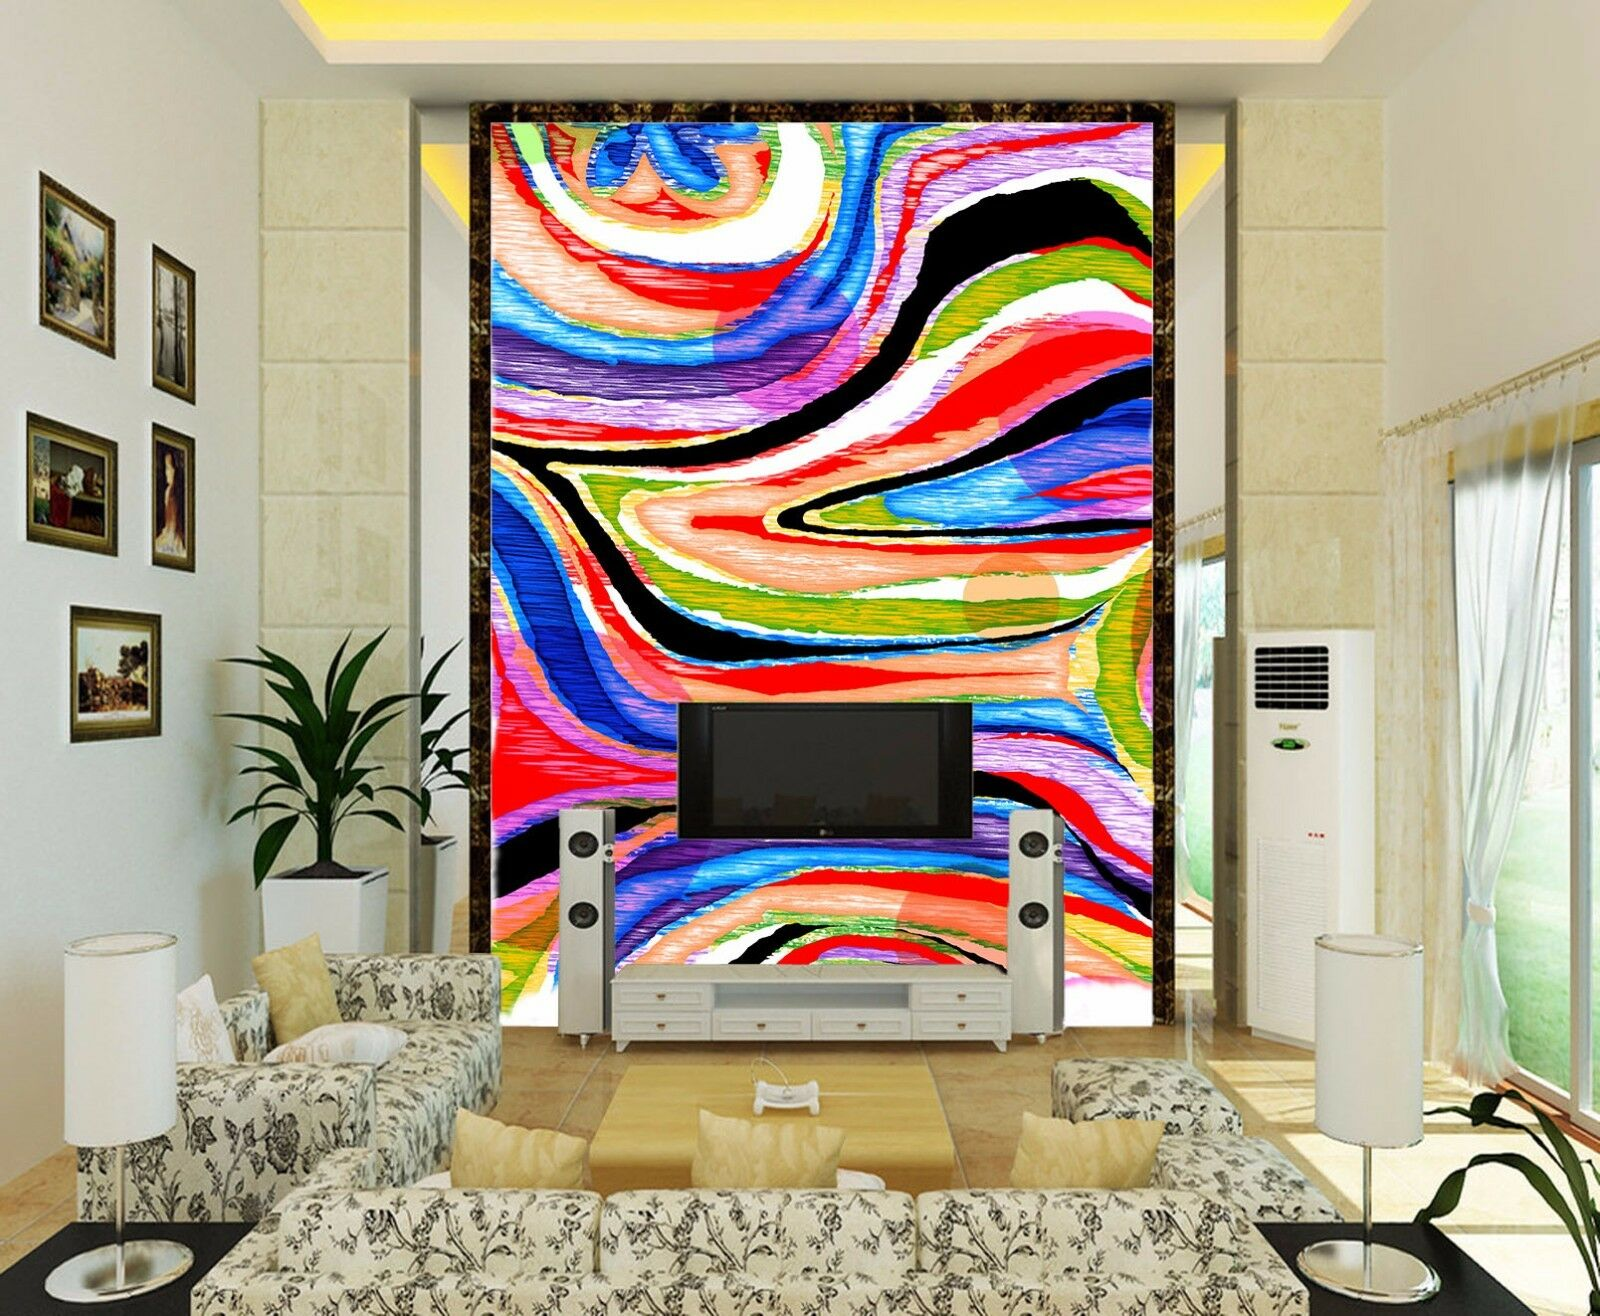 3D Aquarell Aquarell Aquarell Gekritzel 8 Tapete Wandgemälde Tapete Tapeten Bild Familie DE Summer | Günstige Preise  |  091572